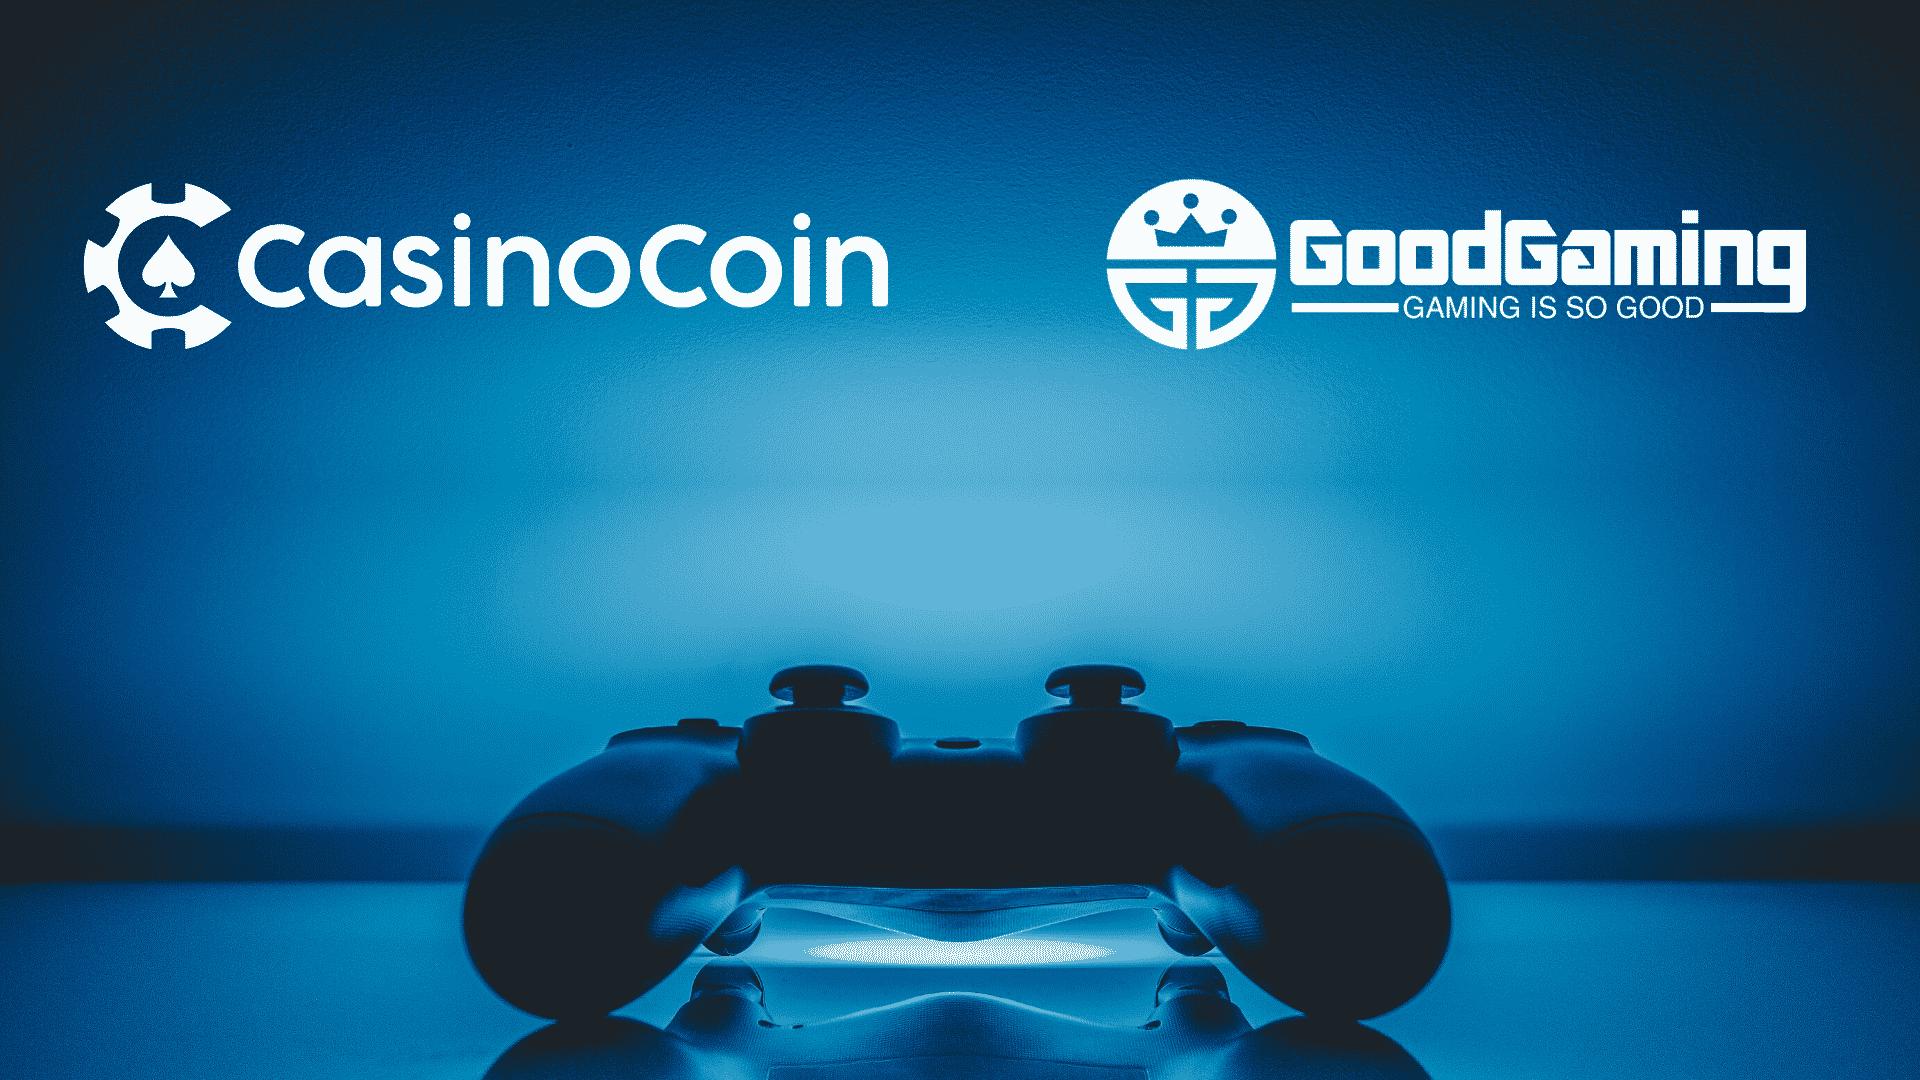 casino coin use case